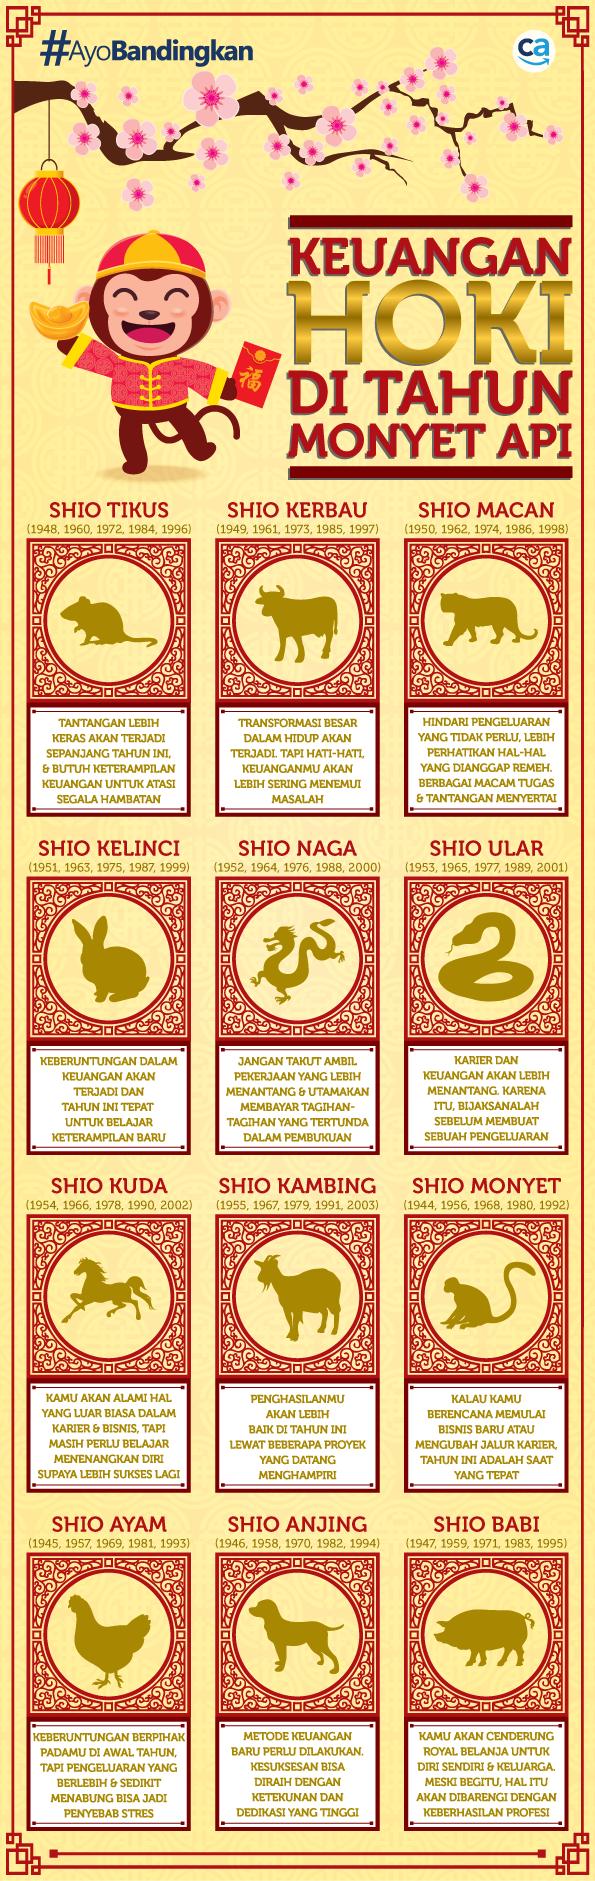 infografis shio di tahun monyet api - CekAja.com